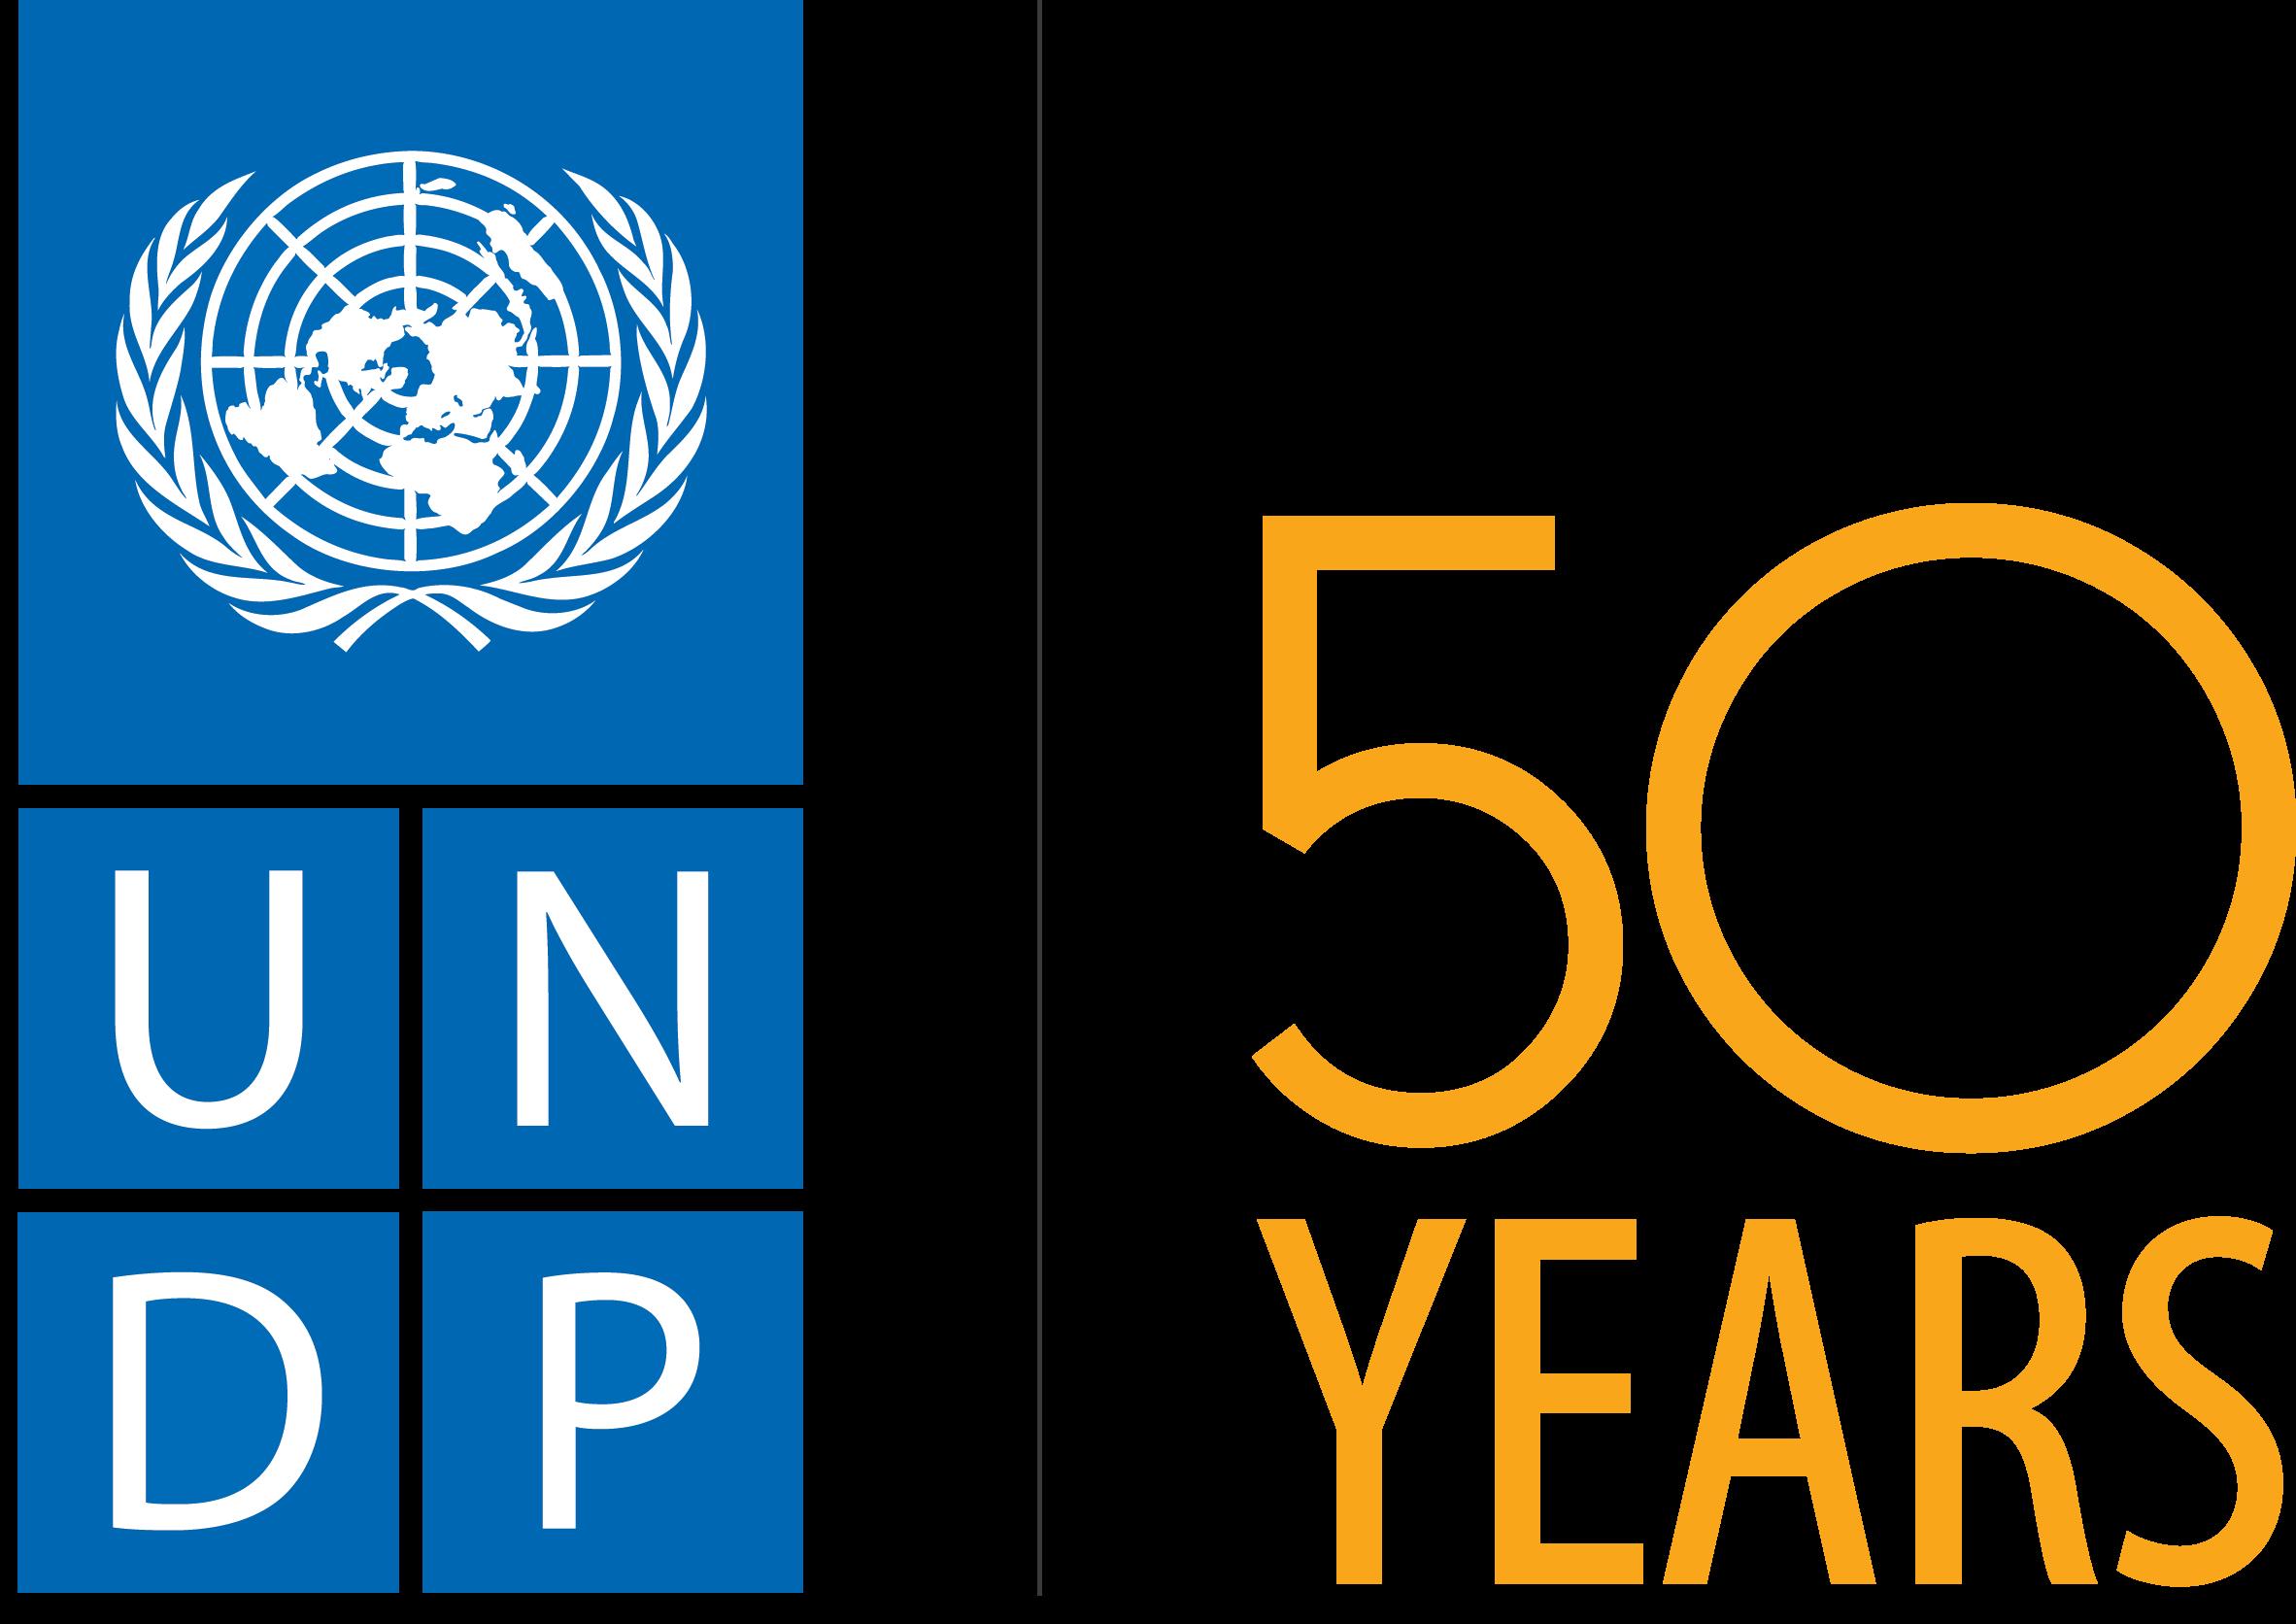 UNDP_50_En-e1456488400719.png